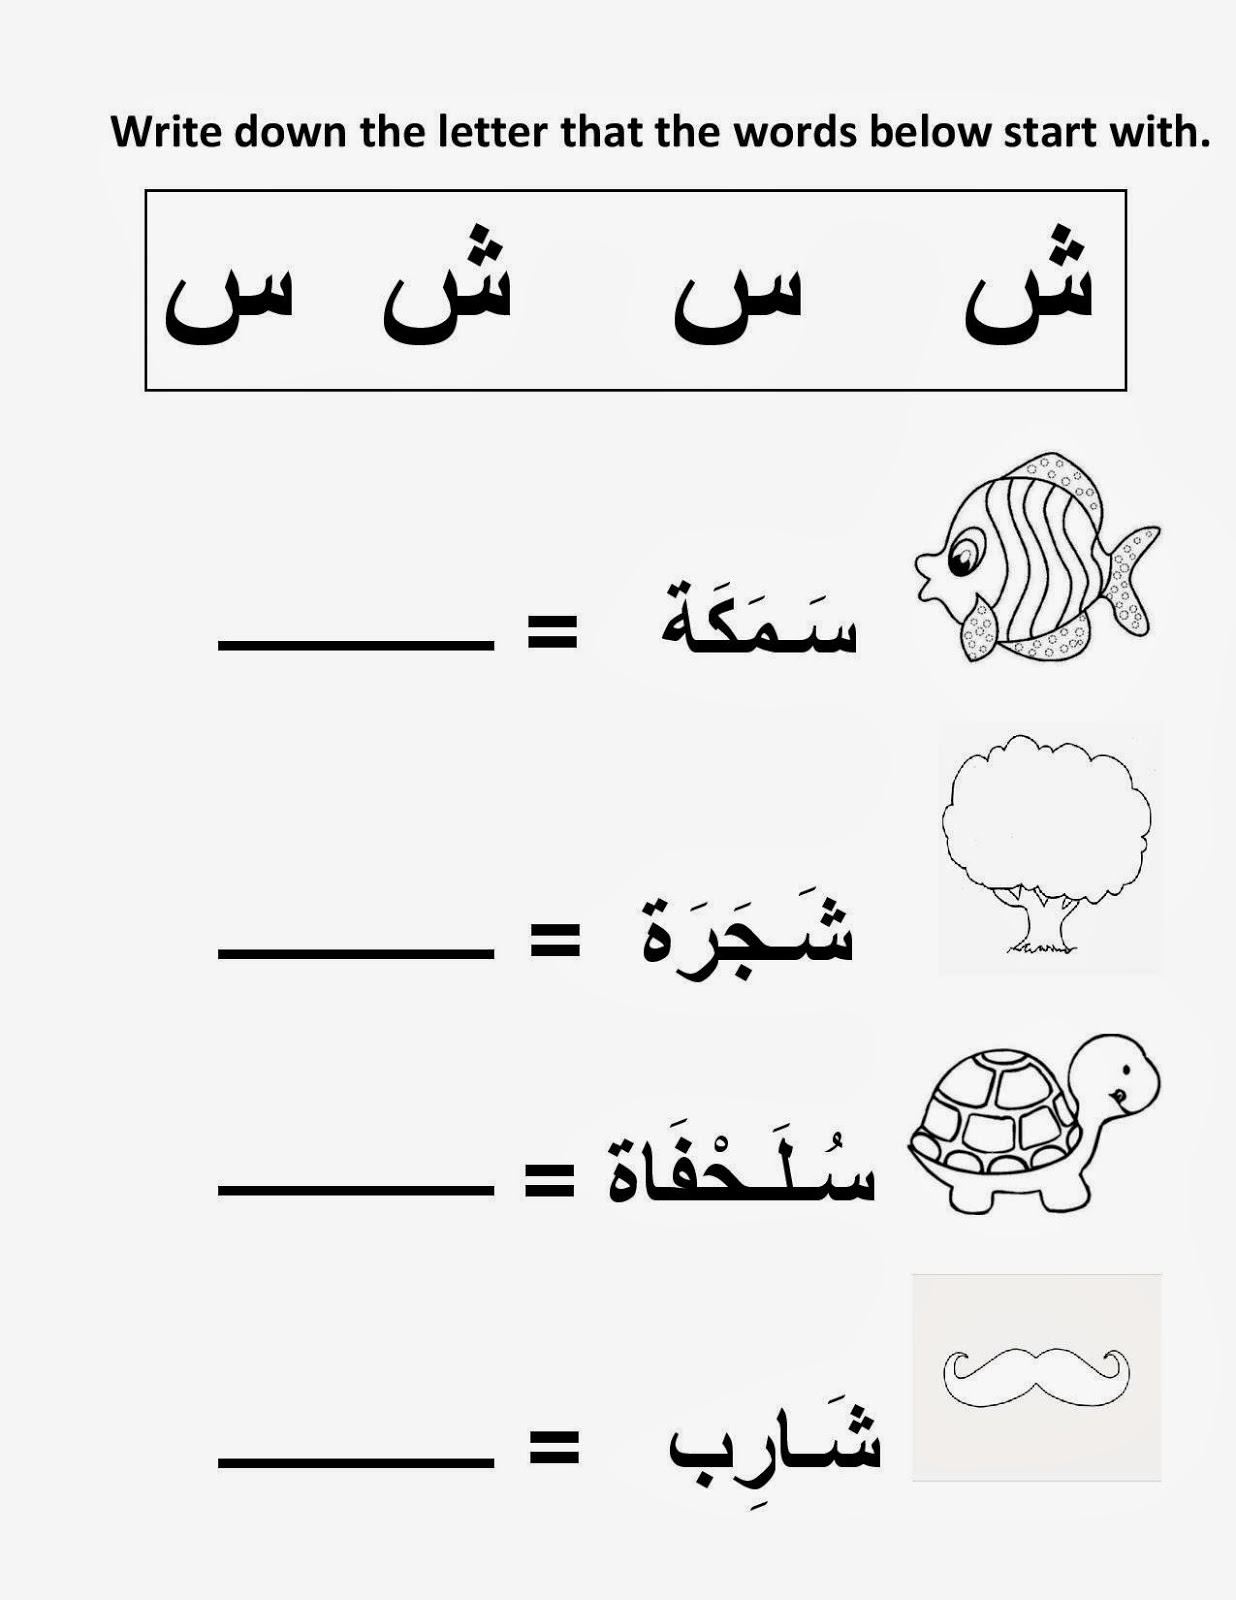 mikahaziq alif ba ta arabic letters worksheet for kids 25th oct. Black Bedroom Furniture Sets. Home Design Ideas